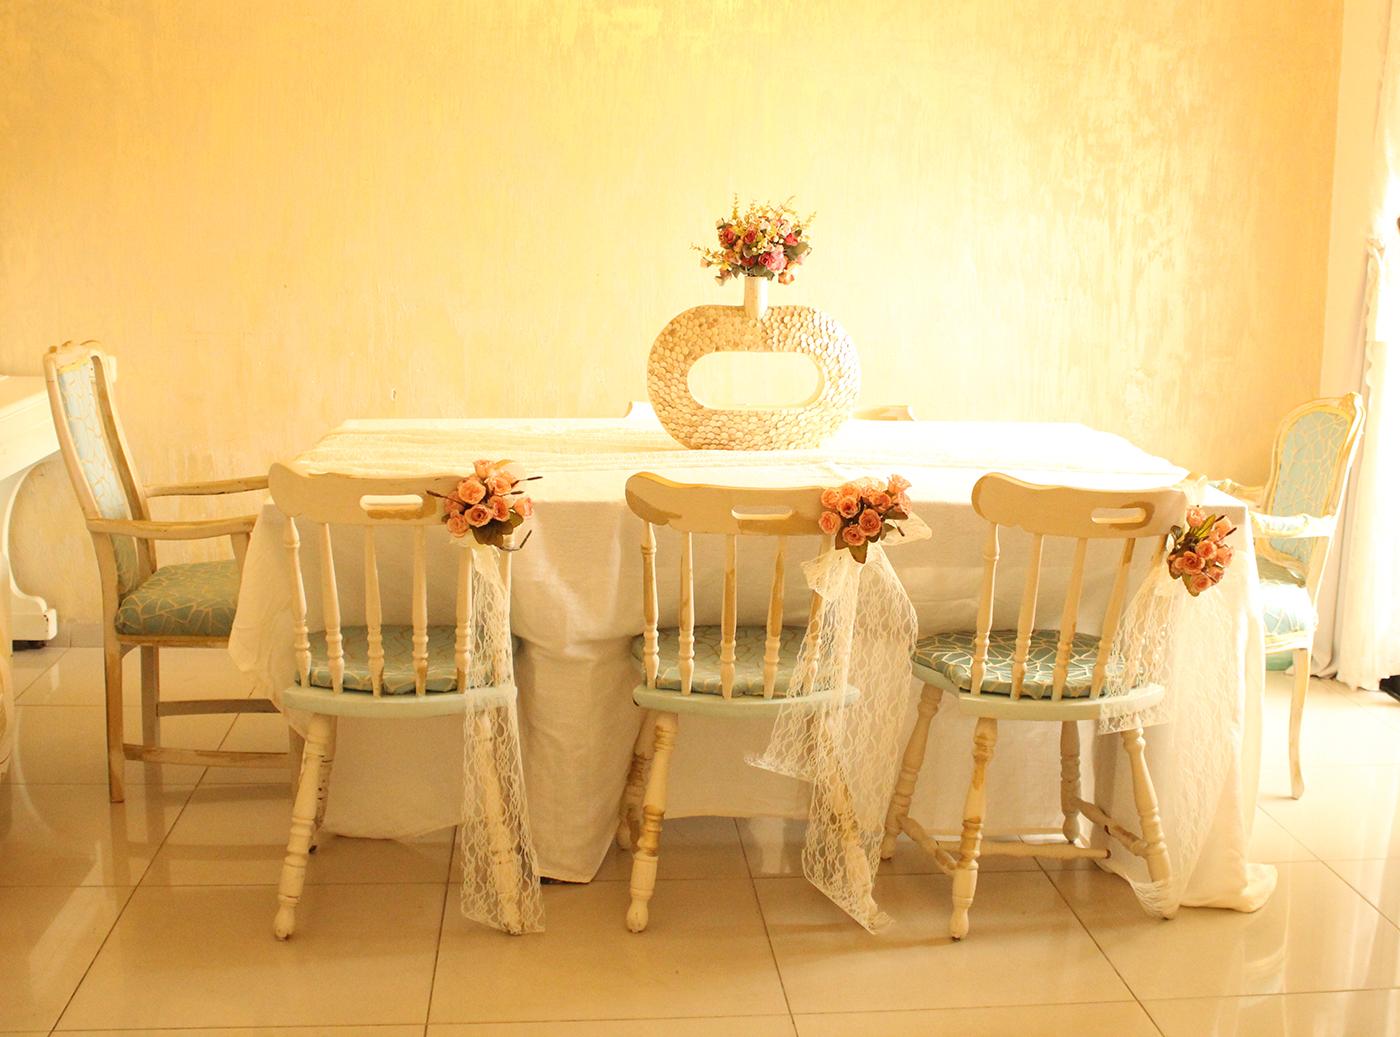 IMG 8069 - חידוש כסאות לפינת אוכל בסלון